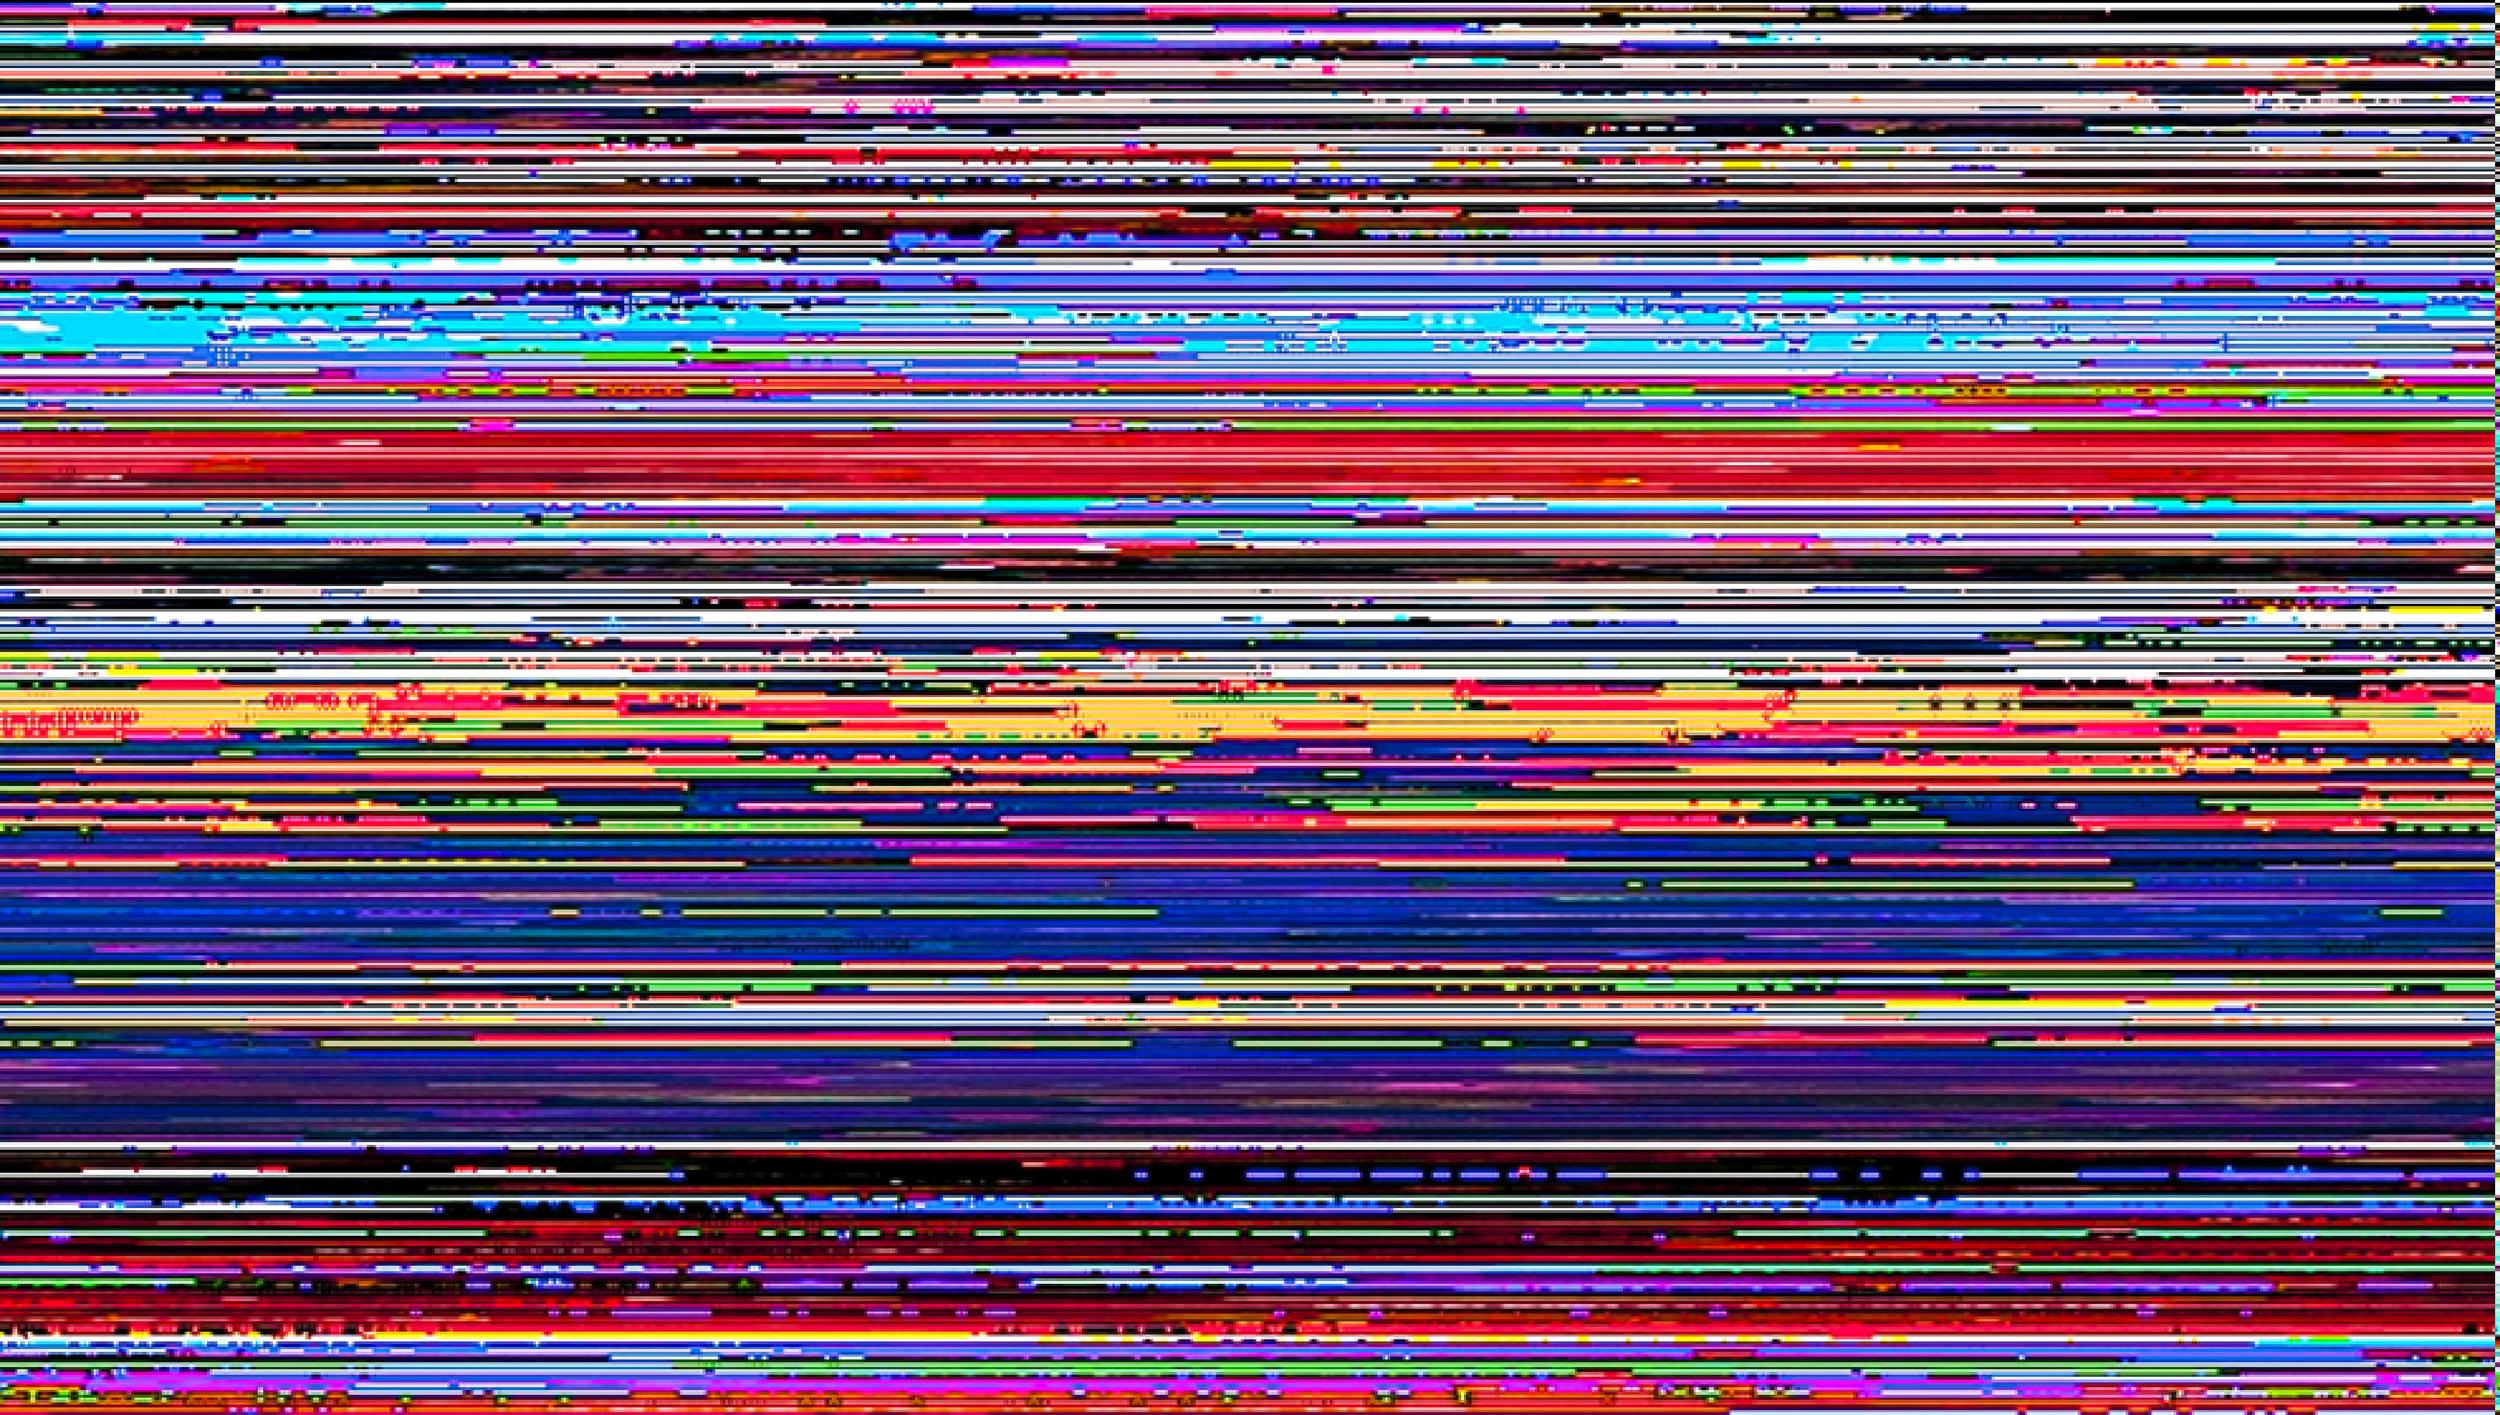 Untitled-7.2.jpg